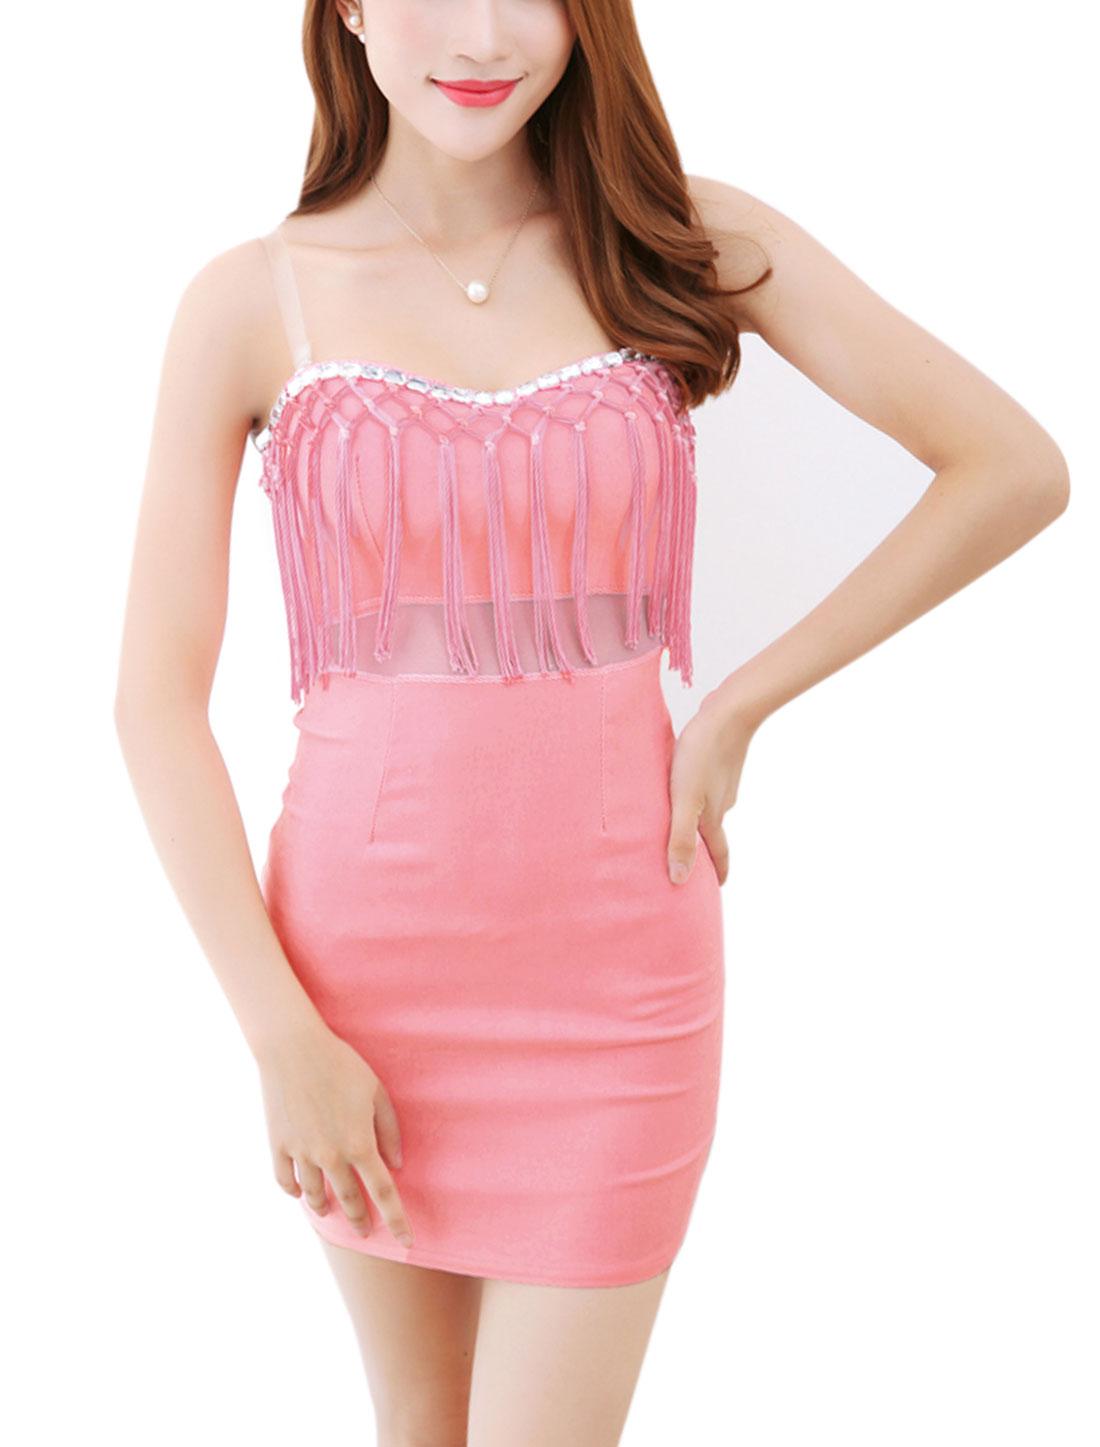 Lady Rhinestones Embellished Mesh Panel Bodycon Dress Pink XS